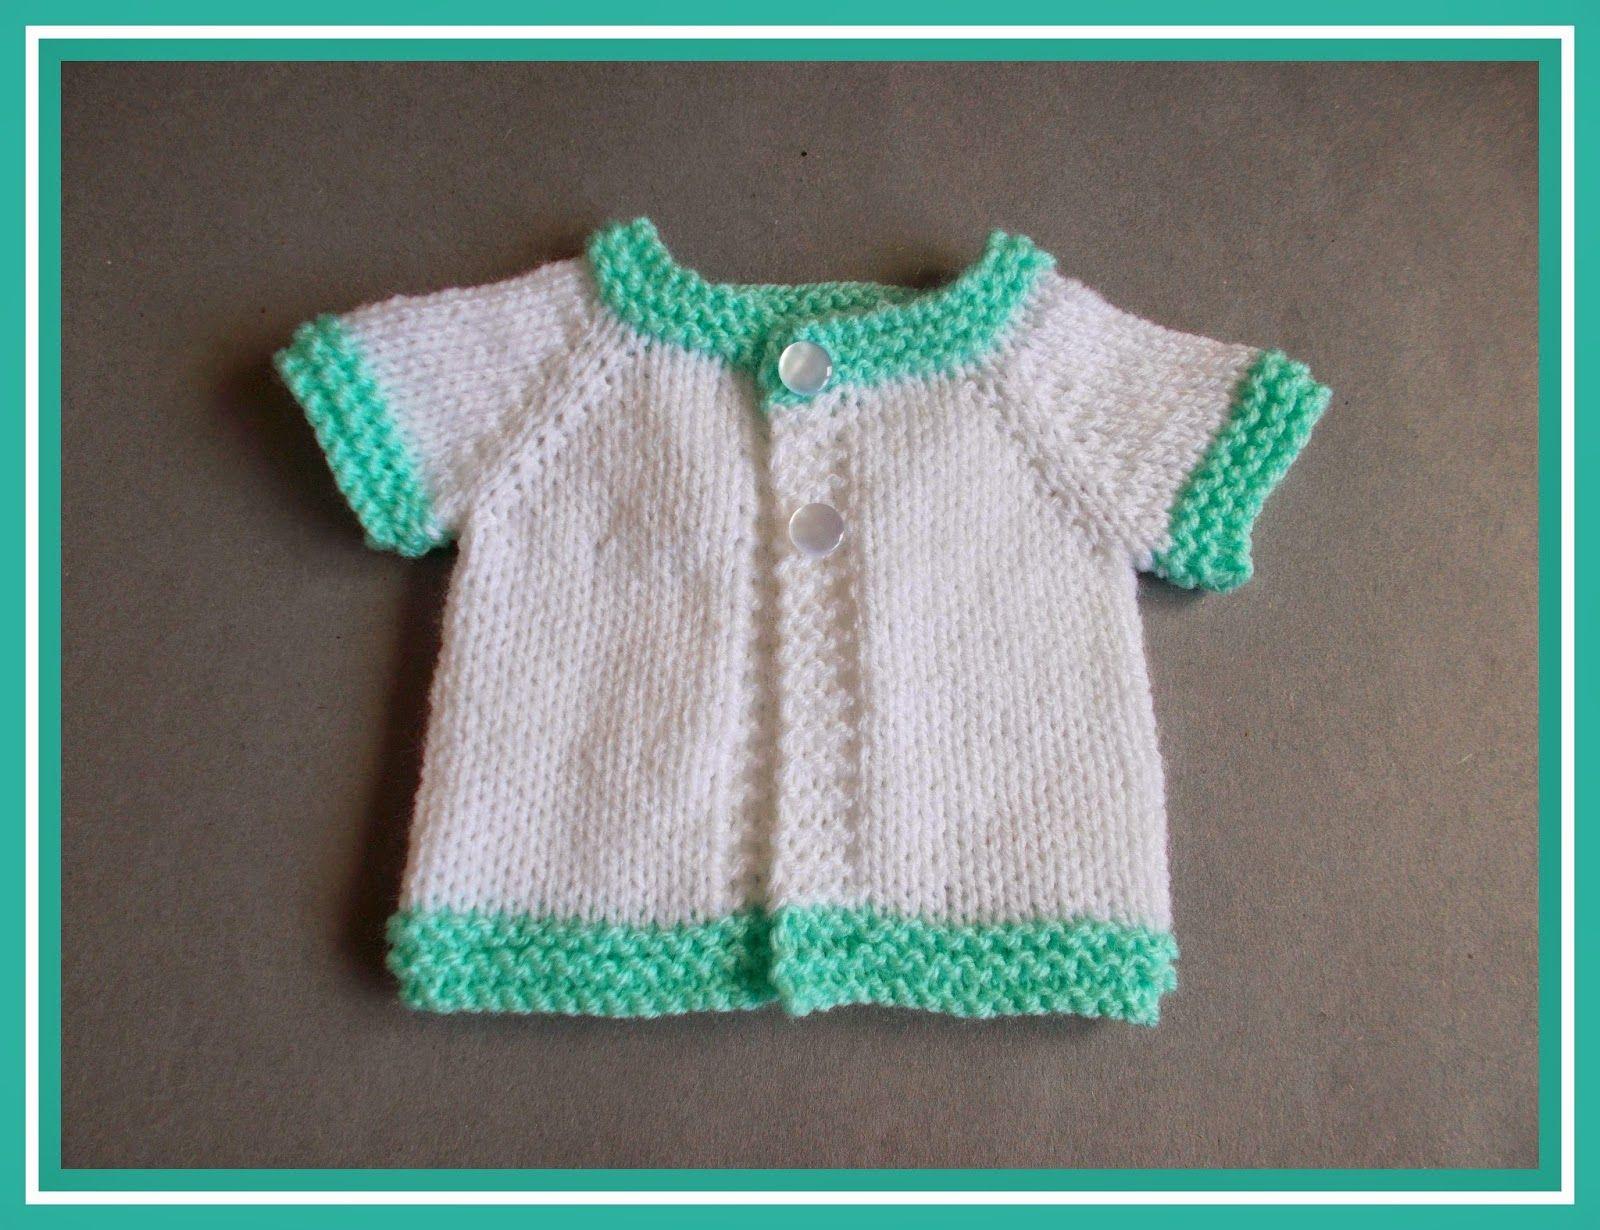 Topaz - Premature Baby Cardi (marianna\'s lazy daisy days) | Babies ...